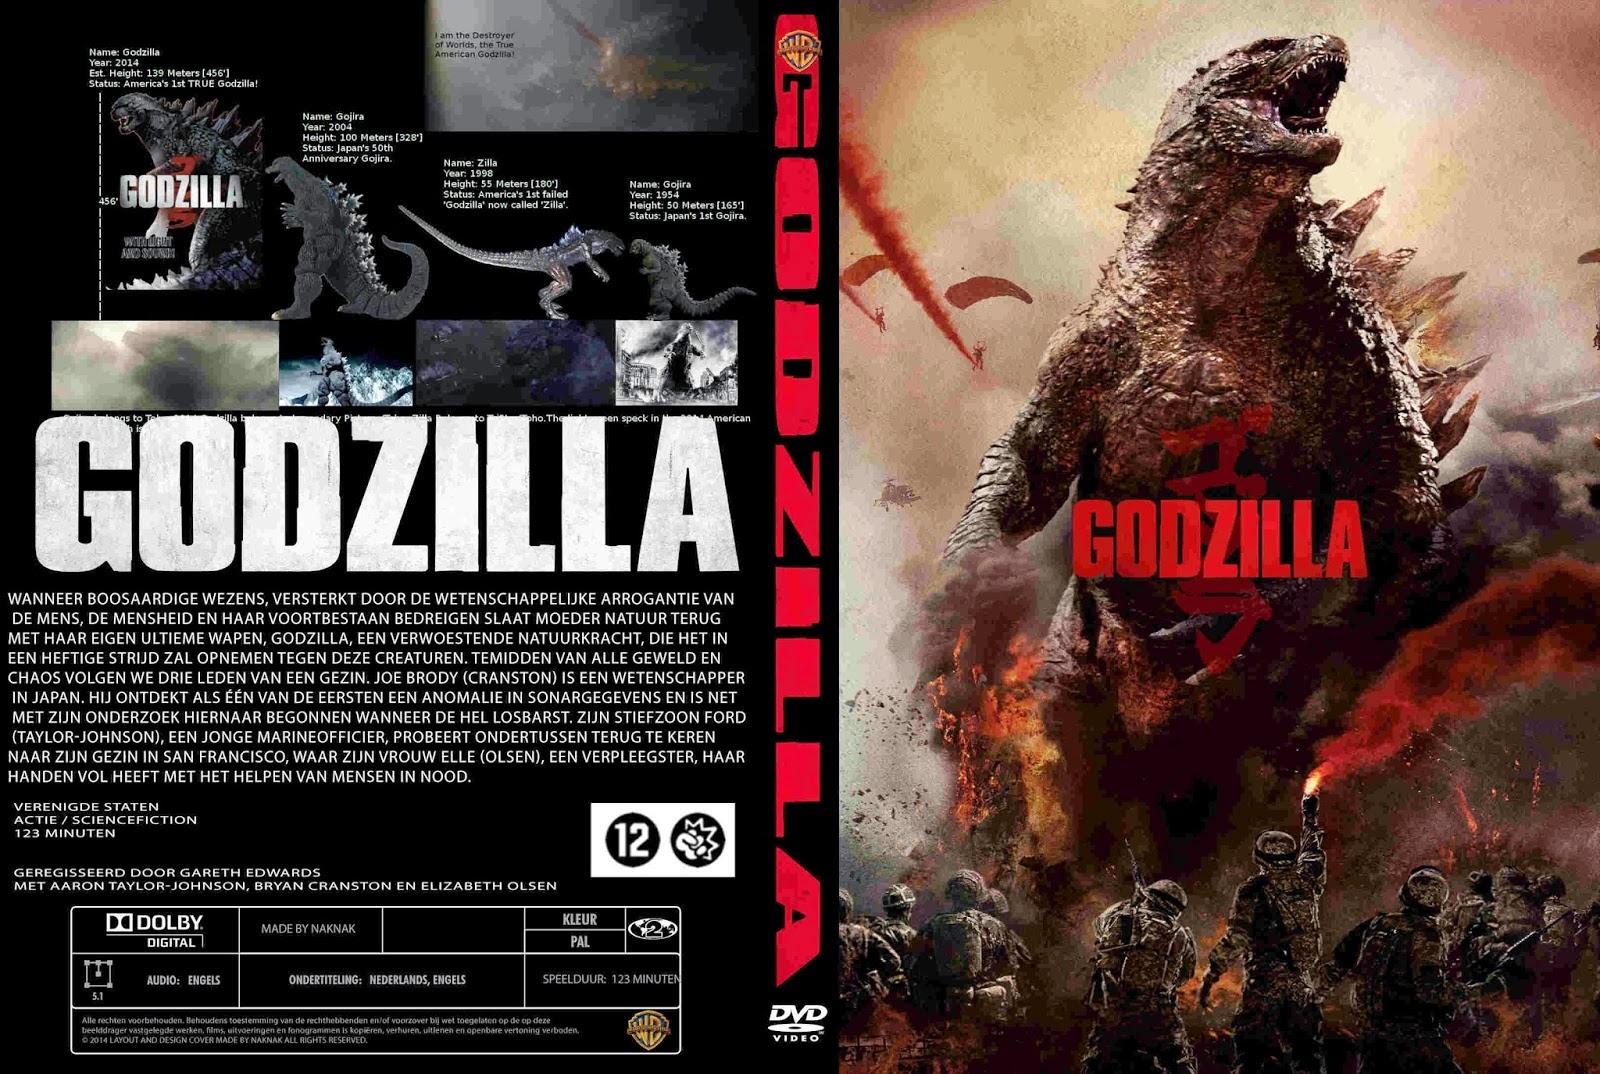 descargar Godzilla 2014 pelicula completa hd latino